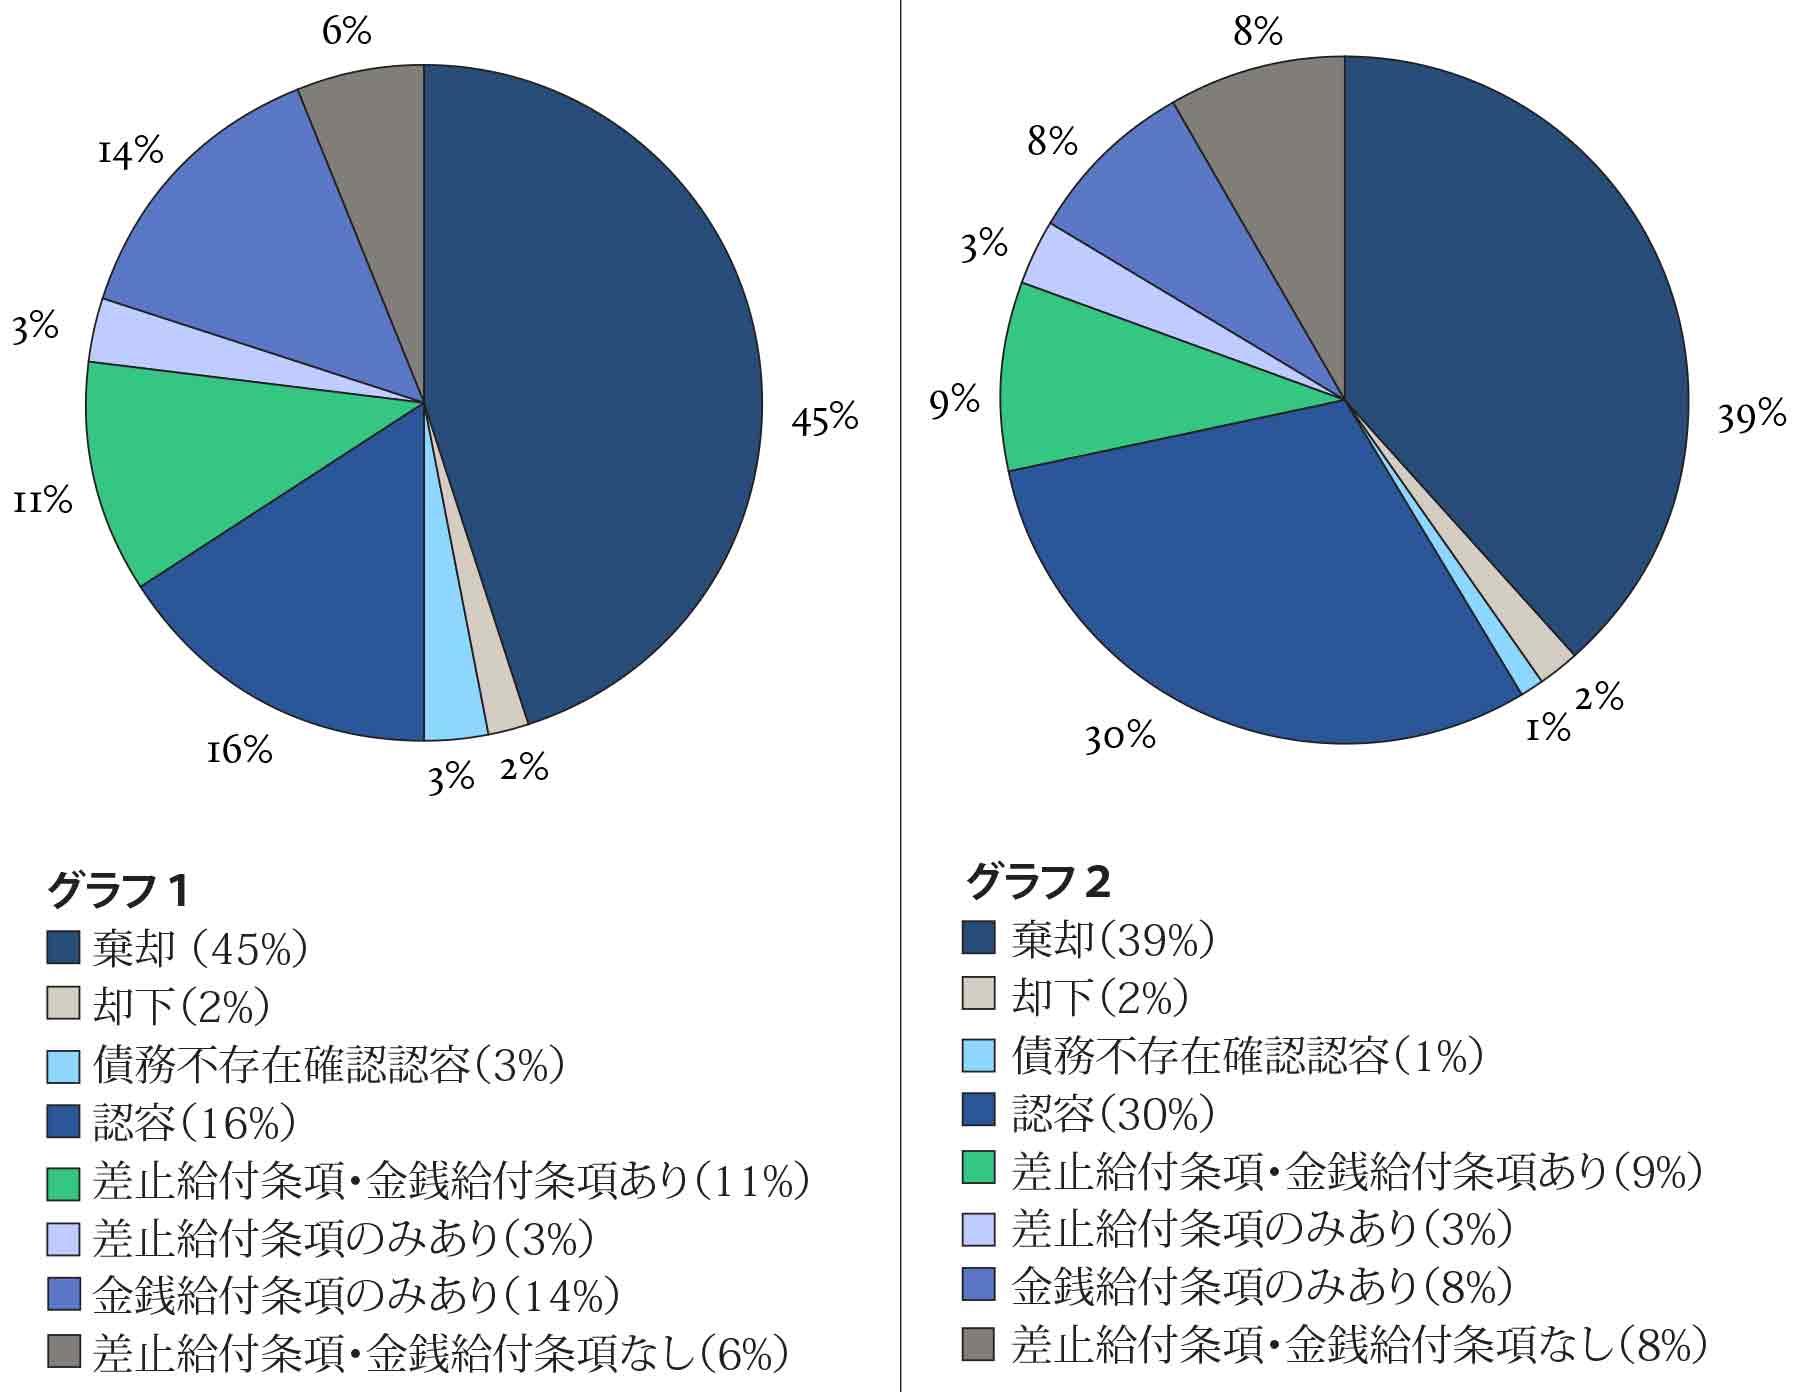 A-COMPARISON-OF-OF-PATENT-LAW-DEVELOPMENT-各国专利法发展对比-Chart-1-2-Japanese